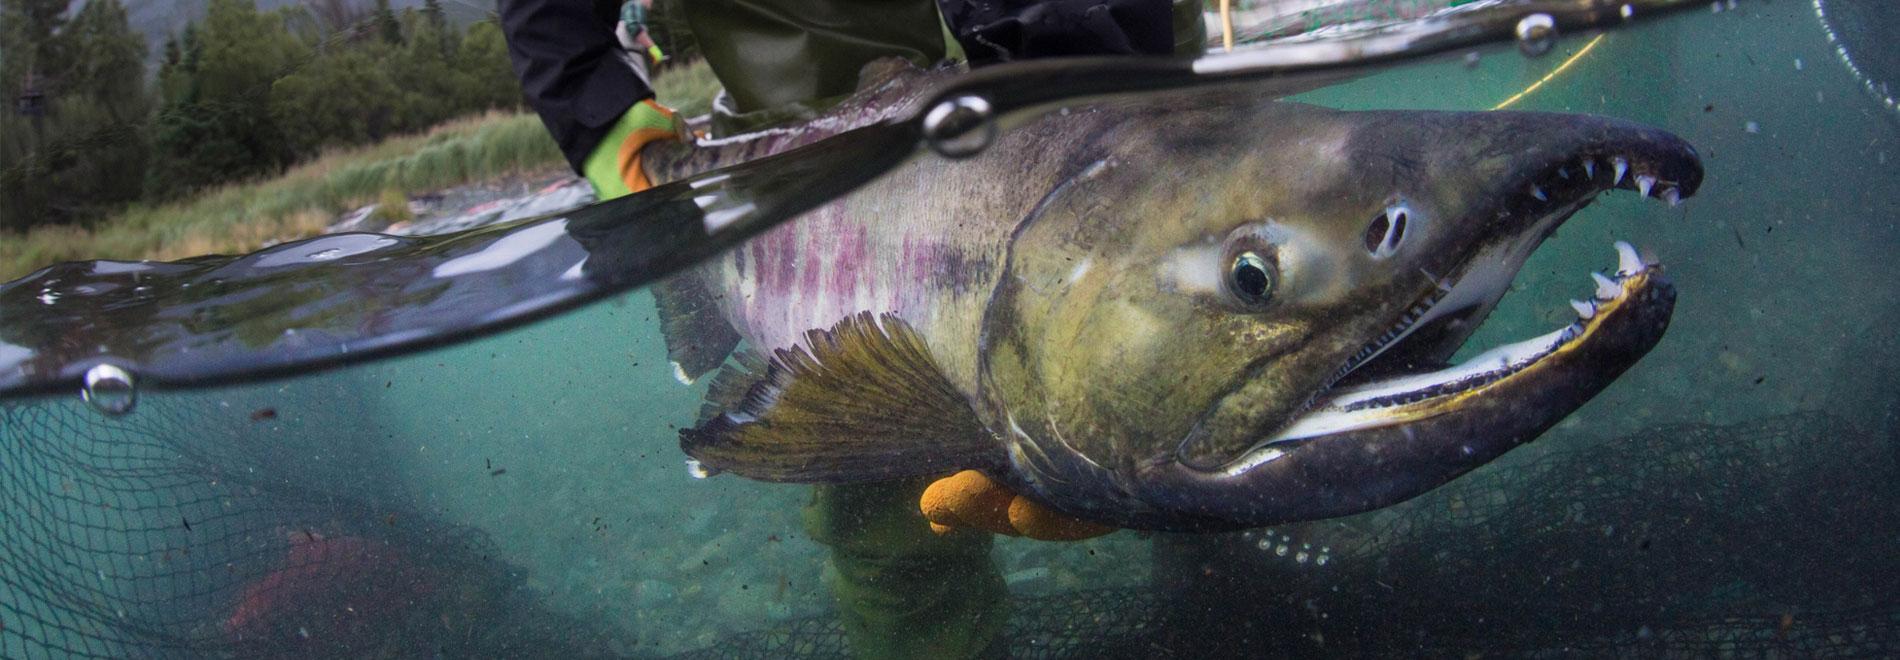 Salmon Held